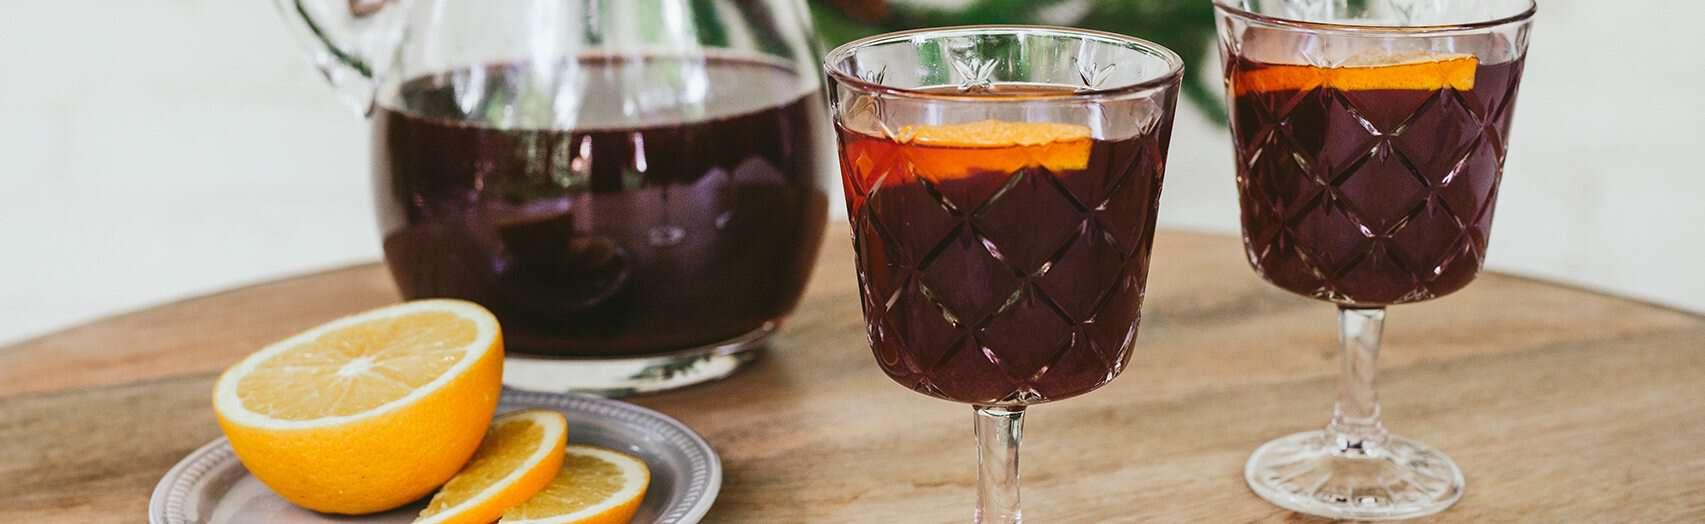 Spiced ginger mulled wine